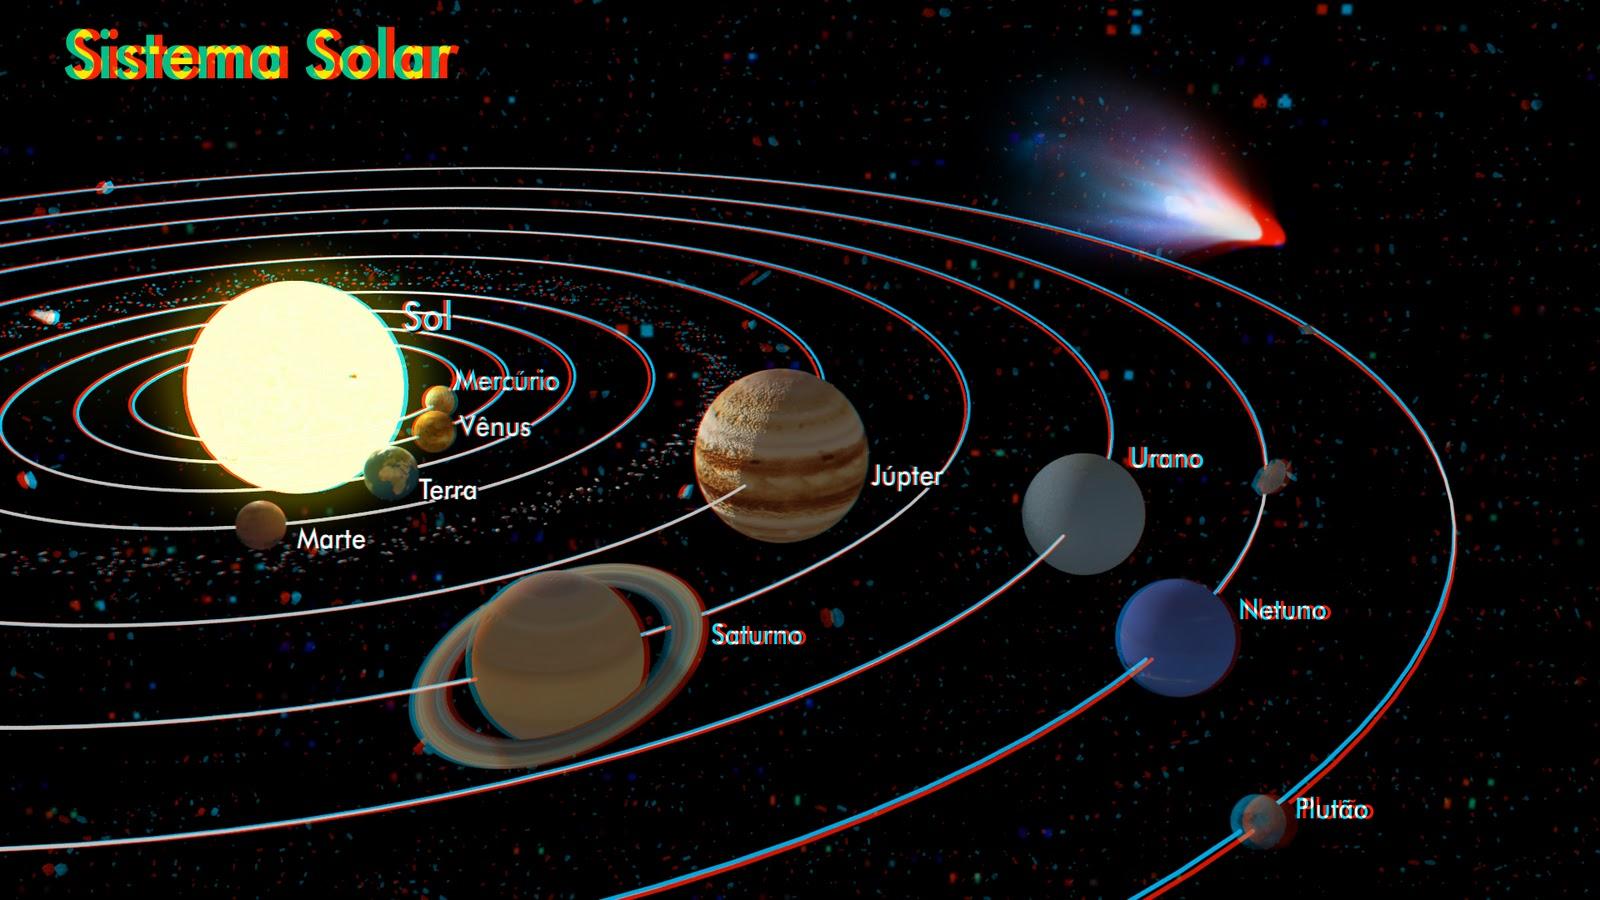 Croquis: Sistema Solar